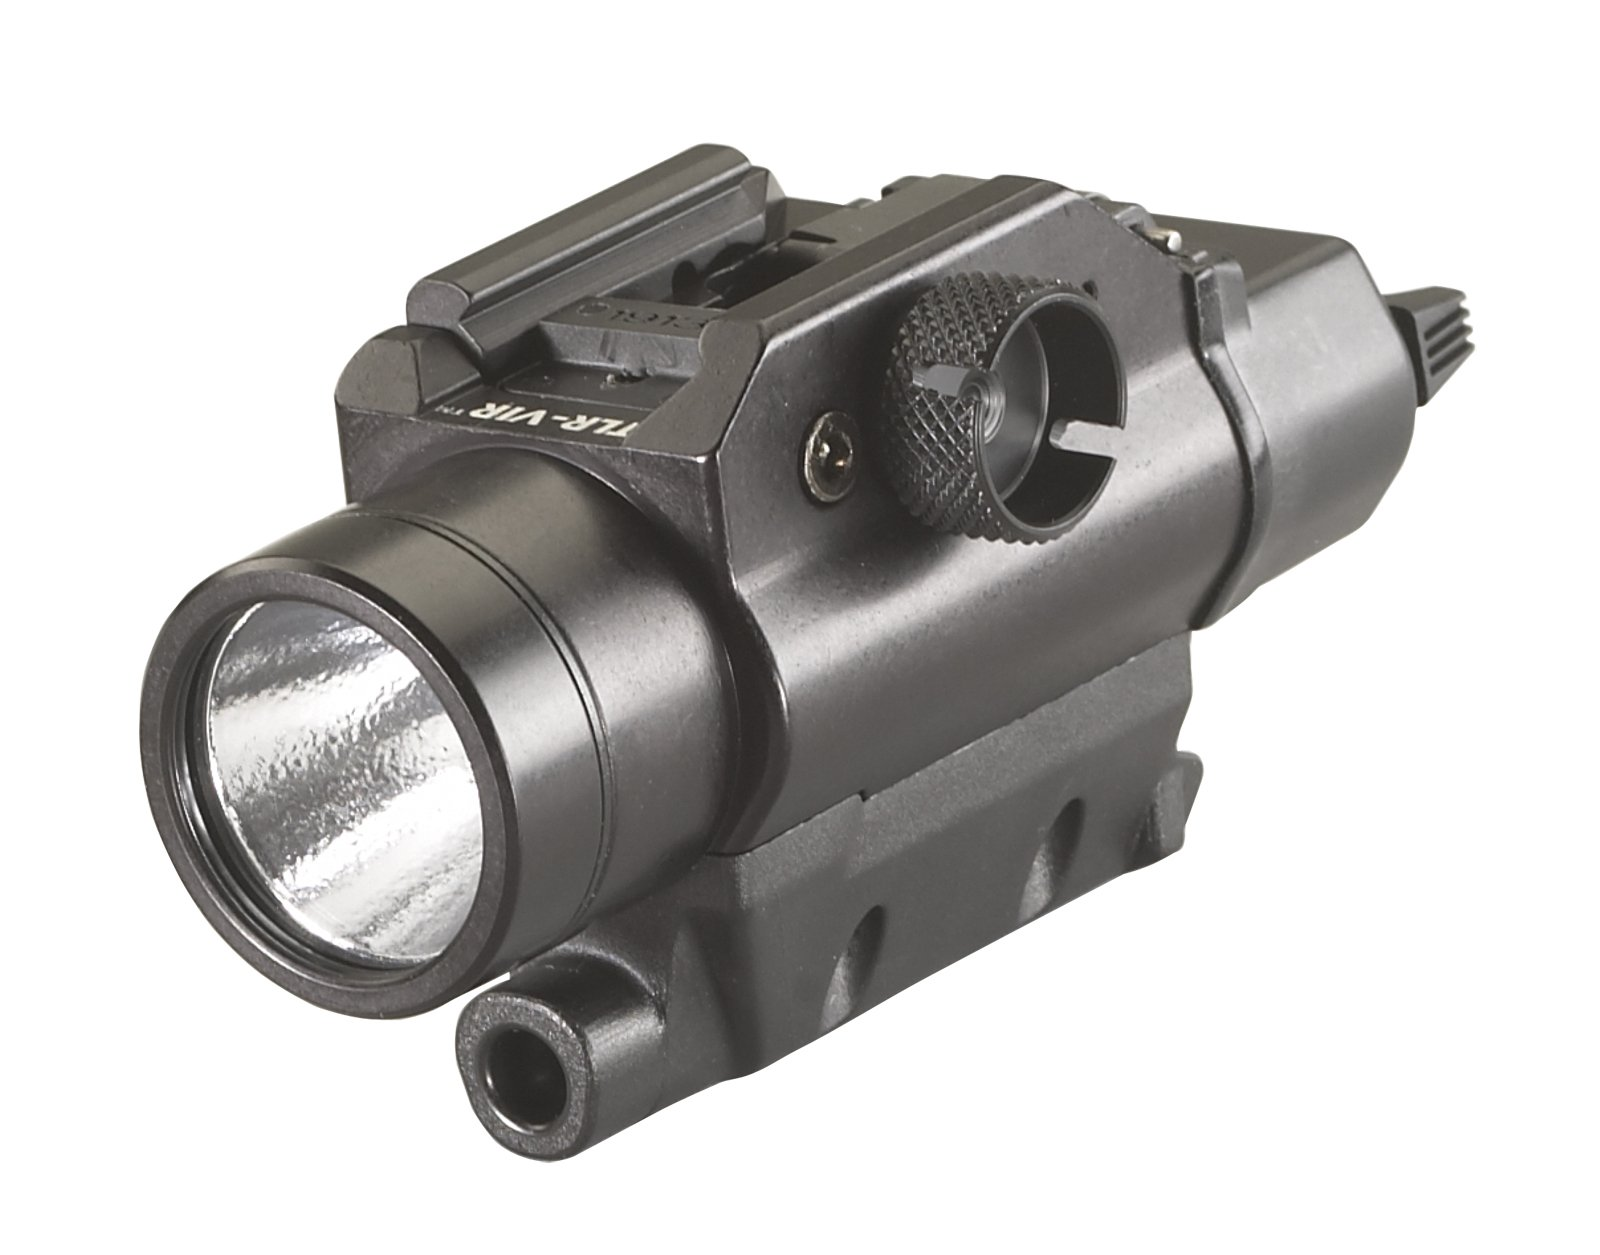 Streamlight 69180 TLR-VIR Visible LED Rail Mounted Flashlight with IR Illuminator by Streamlight